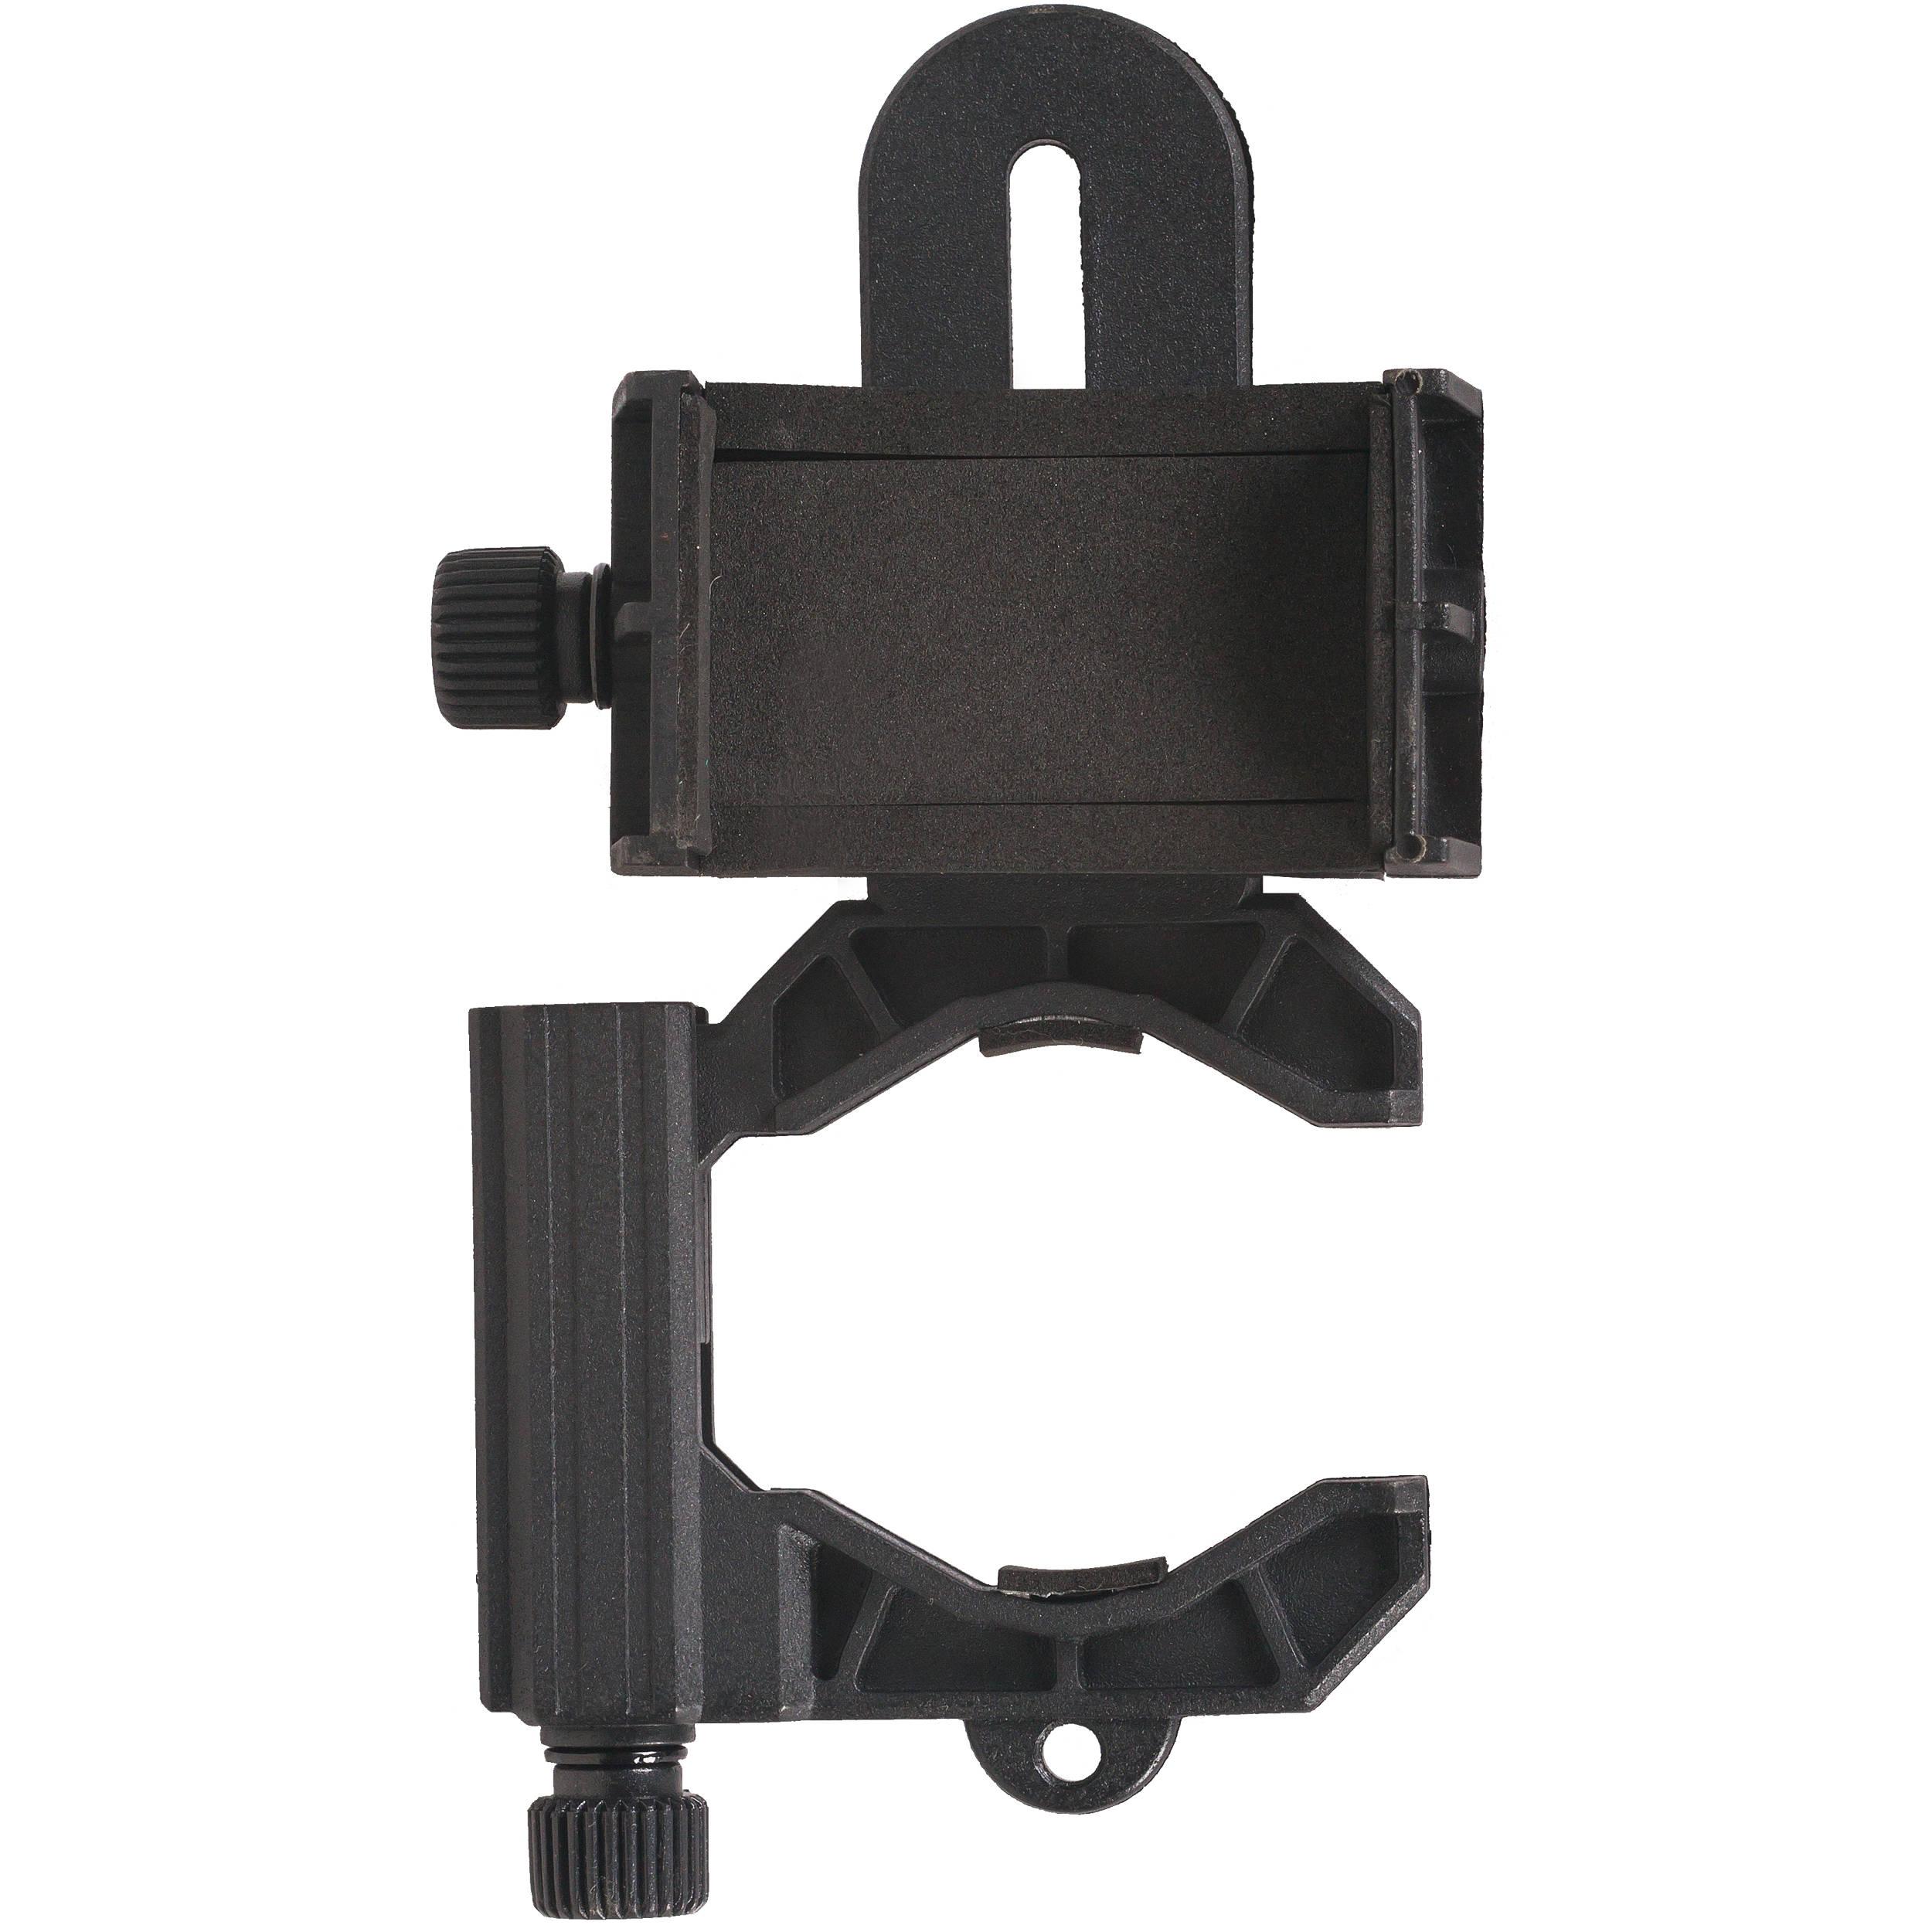 Https C Product 1425971 Reg Blacket Holder Hp Motor Plus Usb Charger X Grip Levenhuk 68766 A10 Smartphone Adapter 1356325